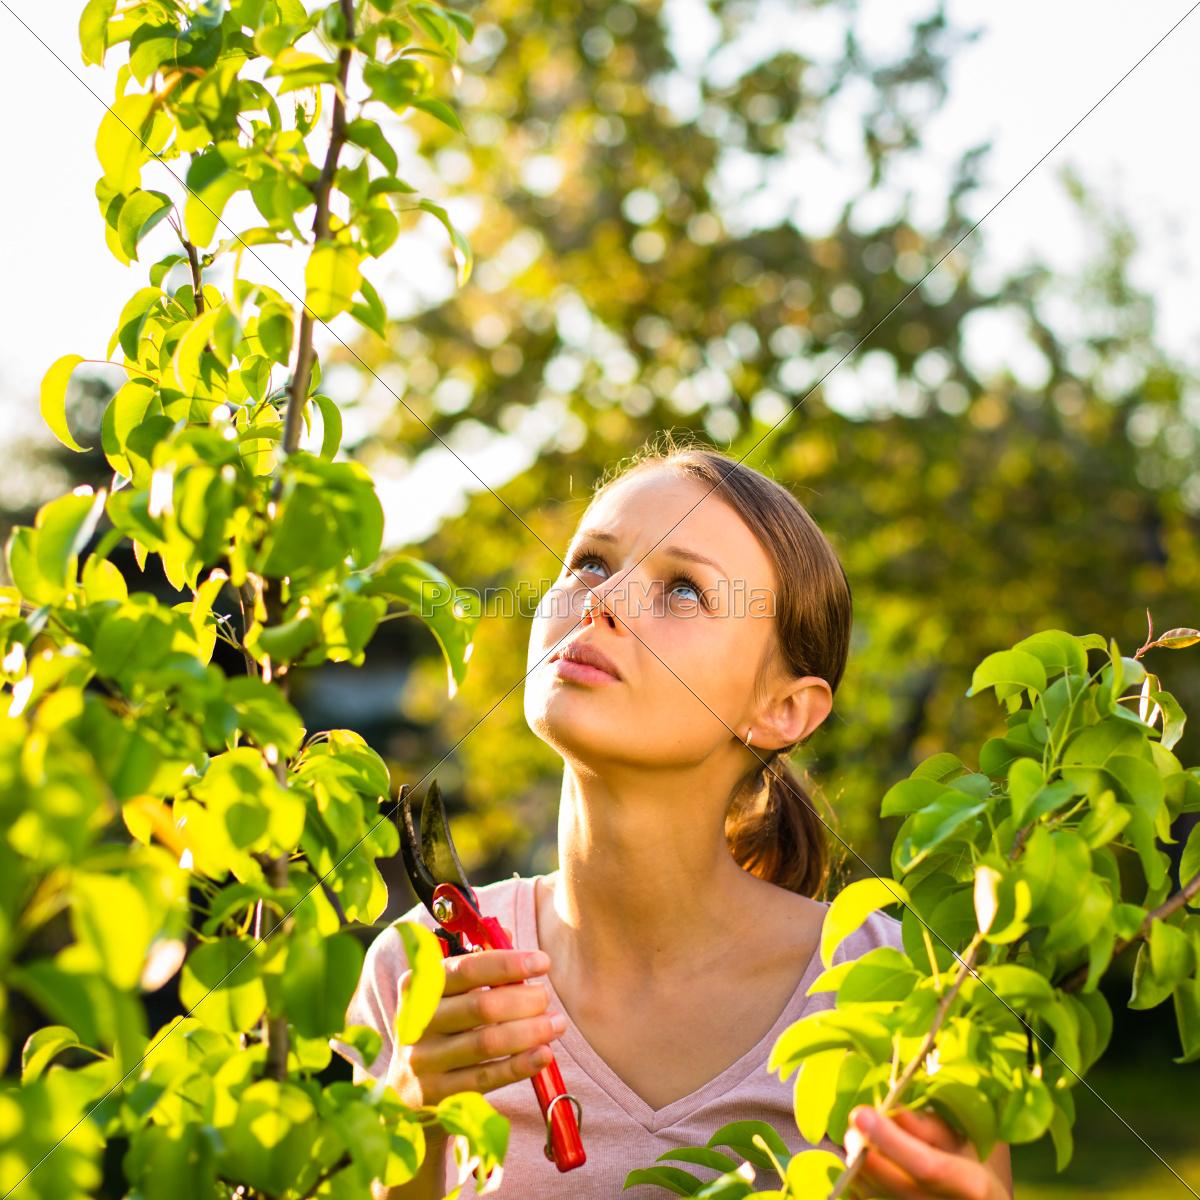 woman, female, garden, flower, plant, gardening - 10110695